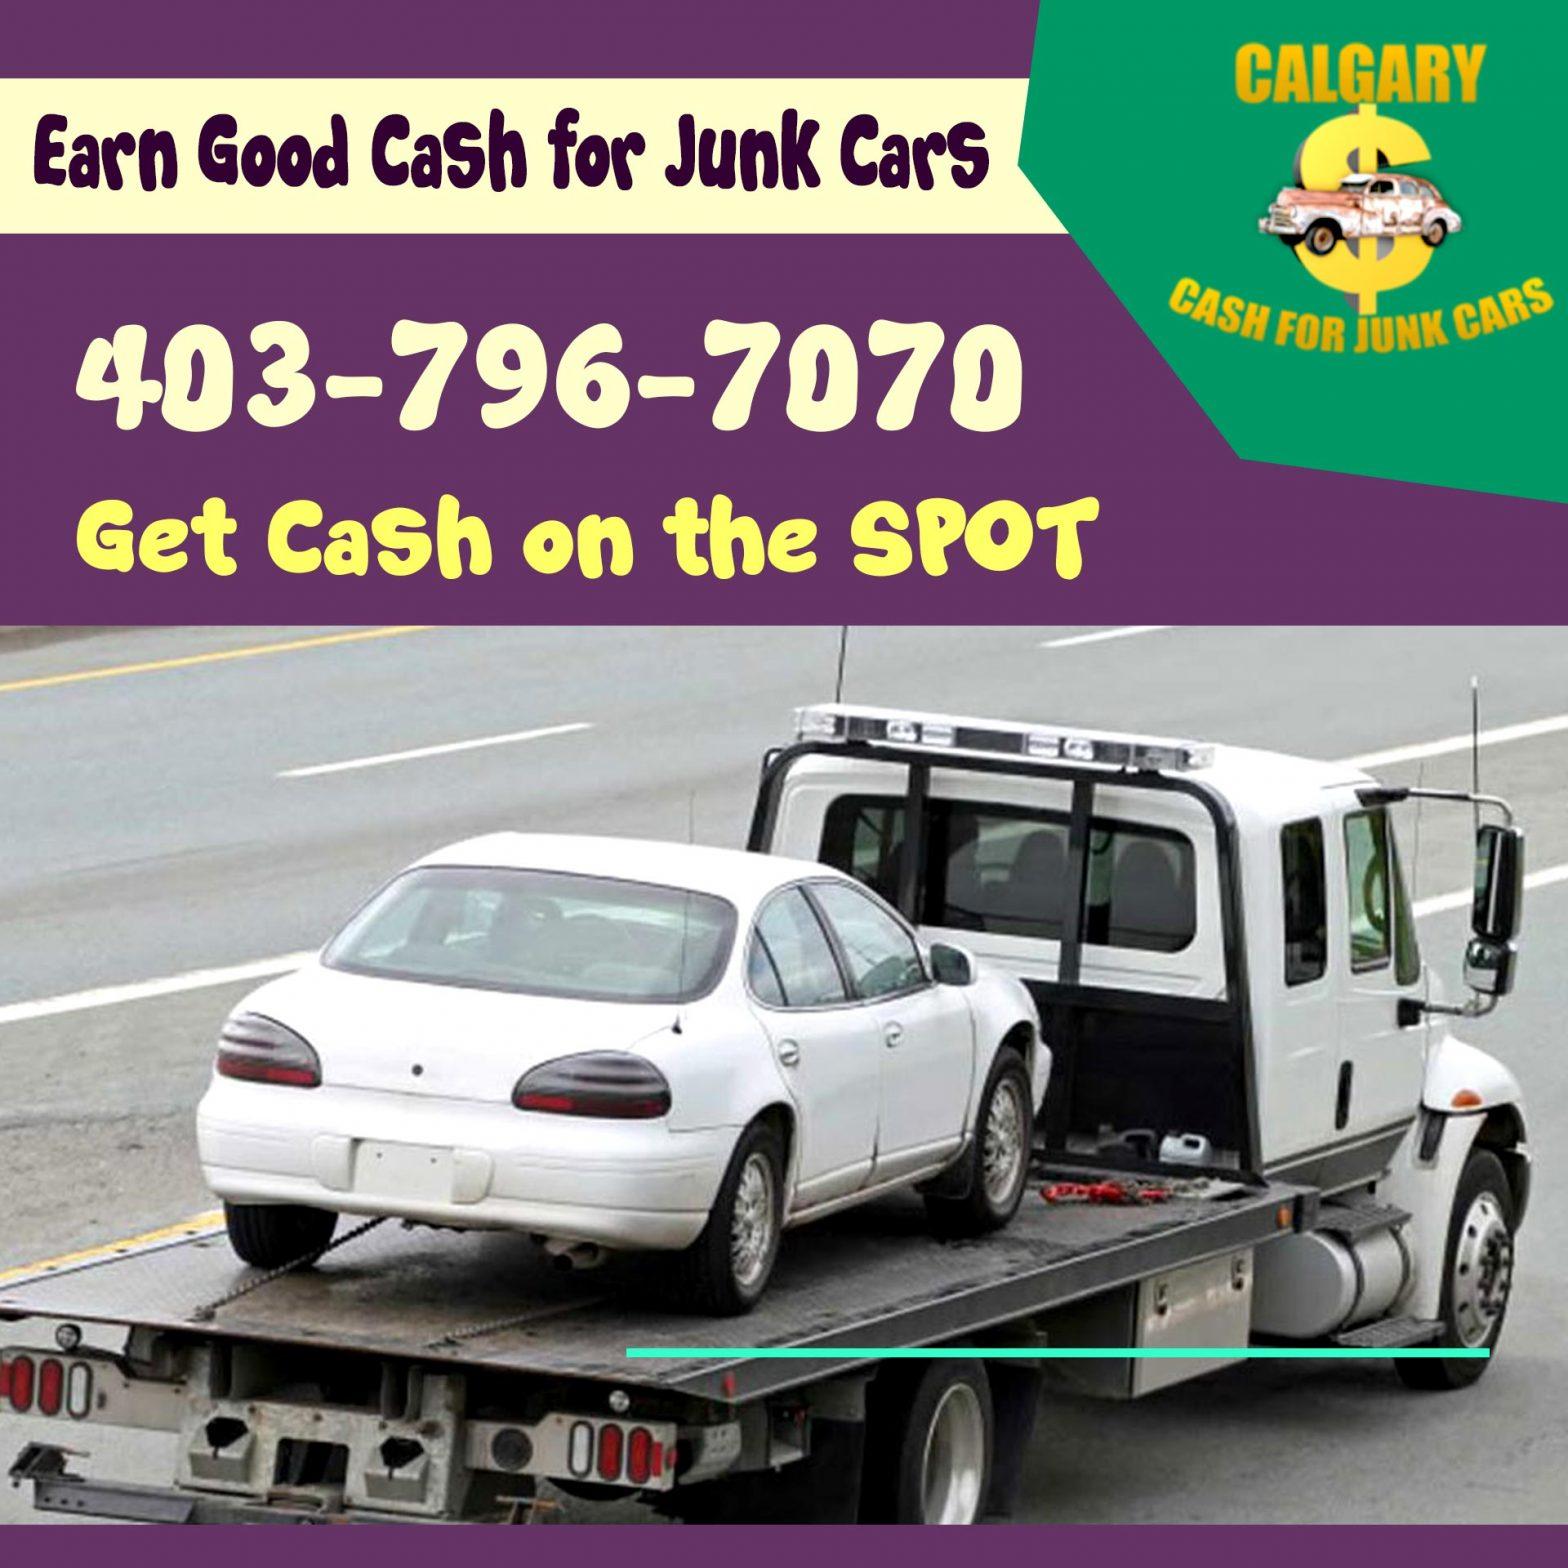 Earn Good Cash for Junk Cars